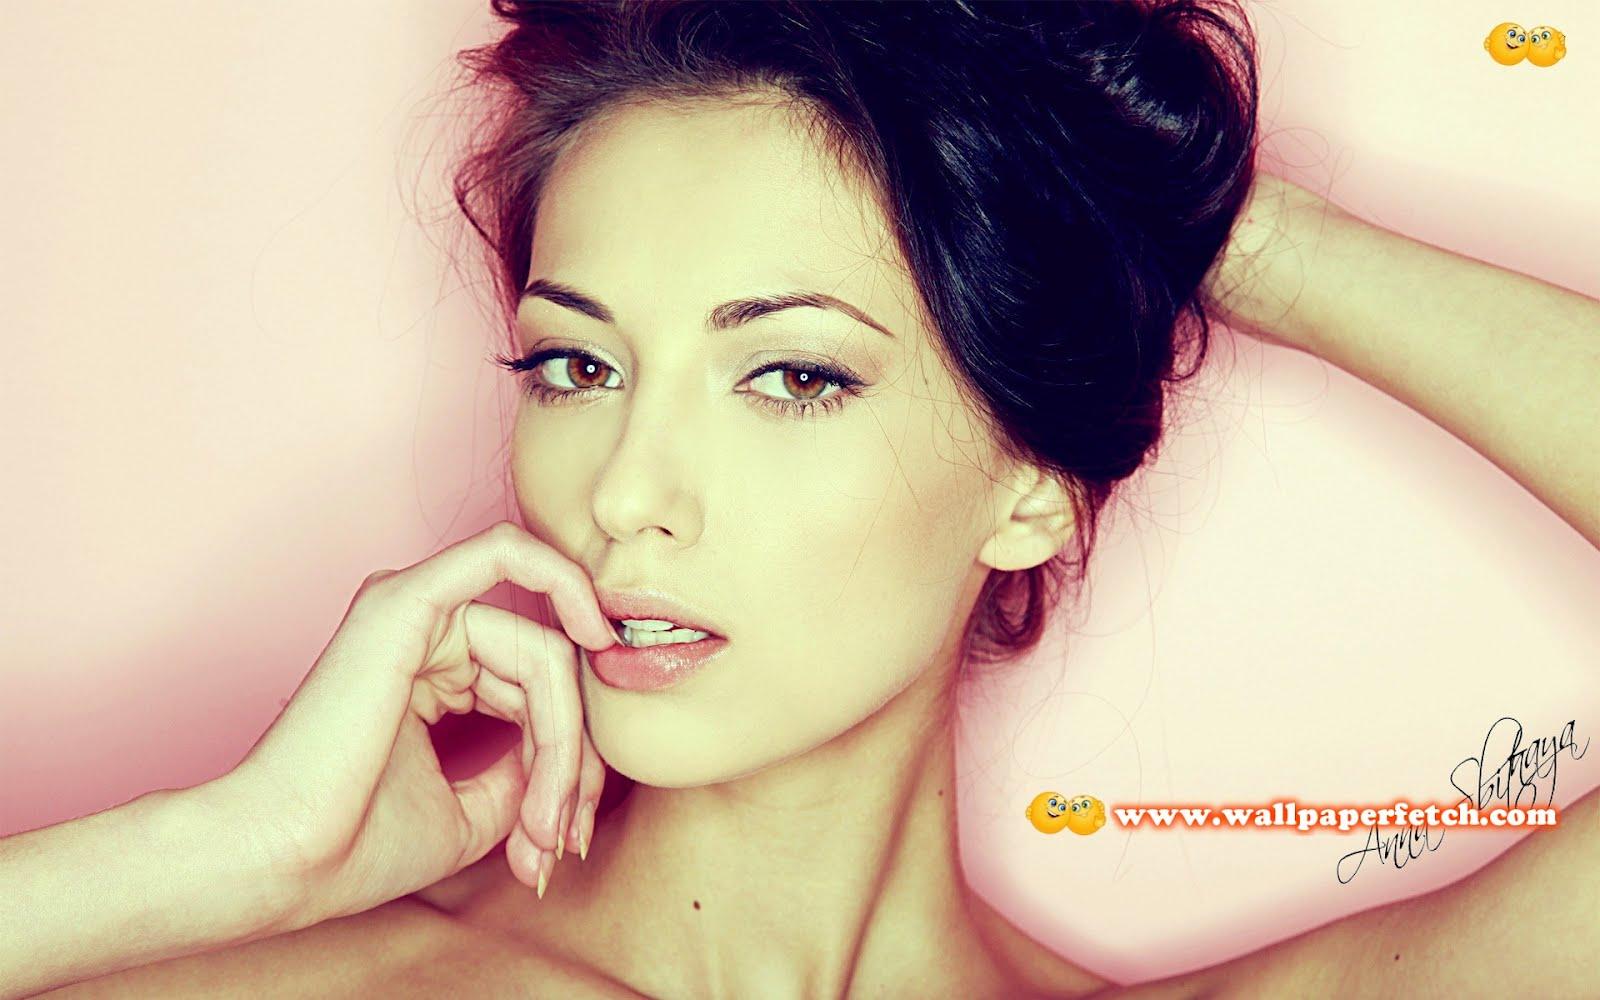 http://4.bp.blogspot.com/-7RjwRJpX790/T1Xn1zXxYSI/AAAAAAAAOZ4/5mrLeFX0nsY/s1600/anna-sbitnaya-5840-1920x1200.jpg